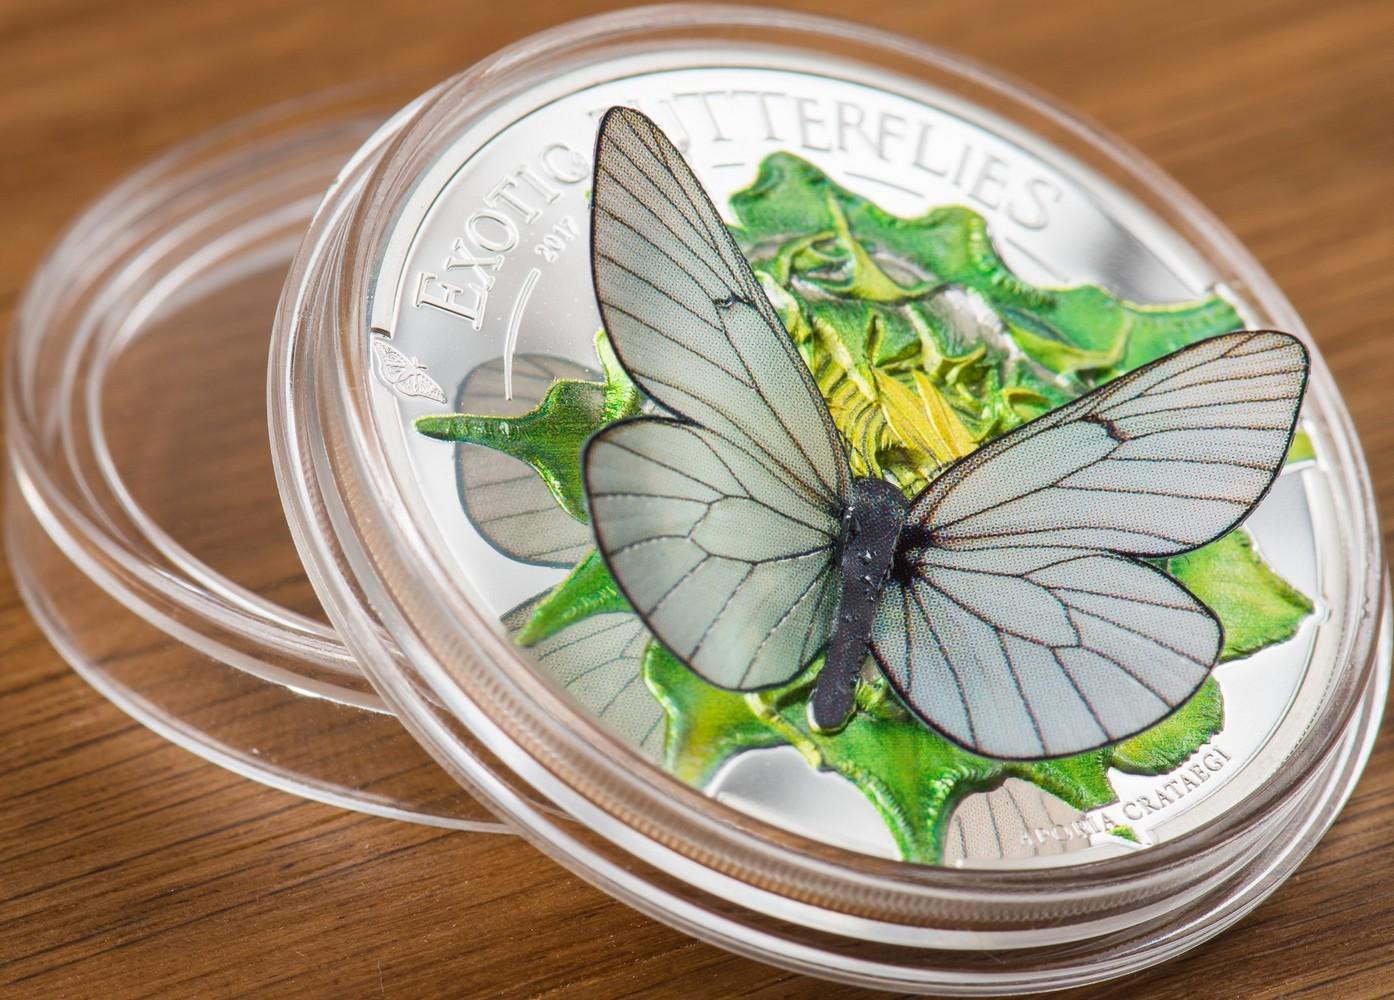 mongolie 2017 papillons exotiques relief